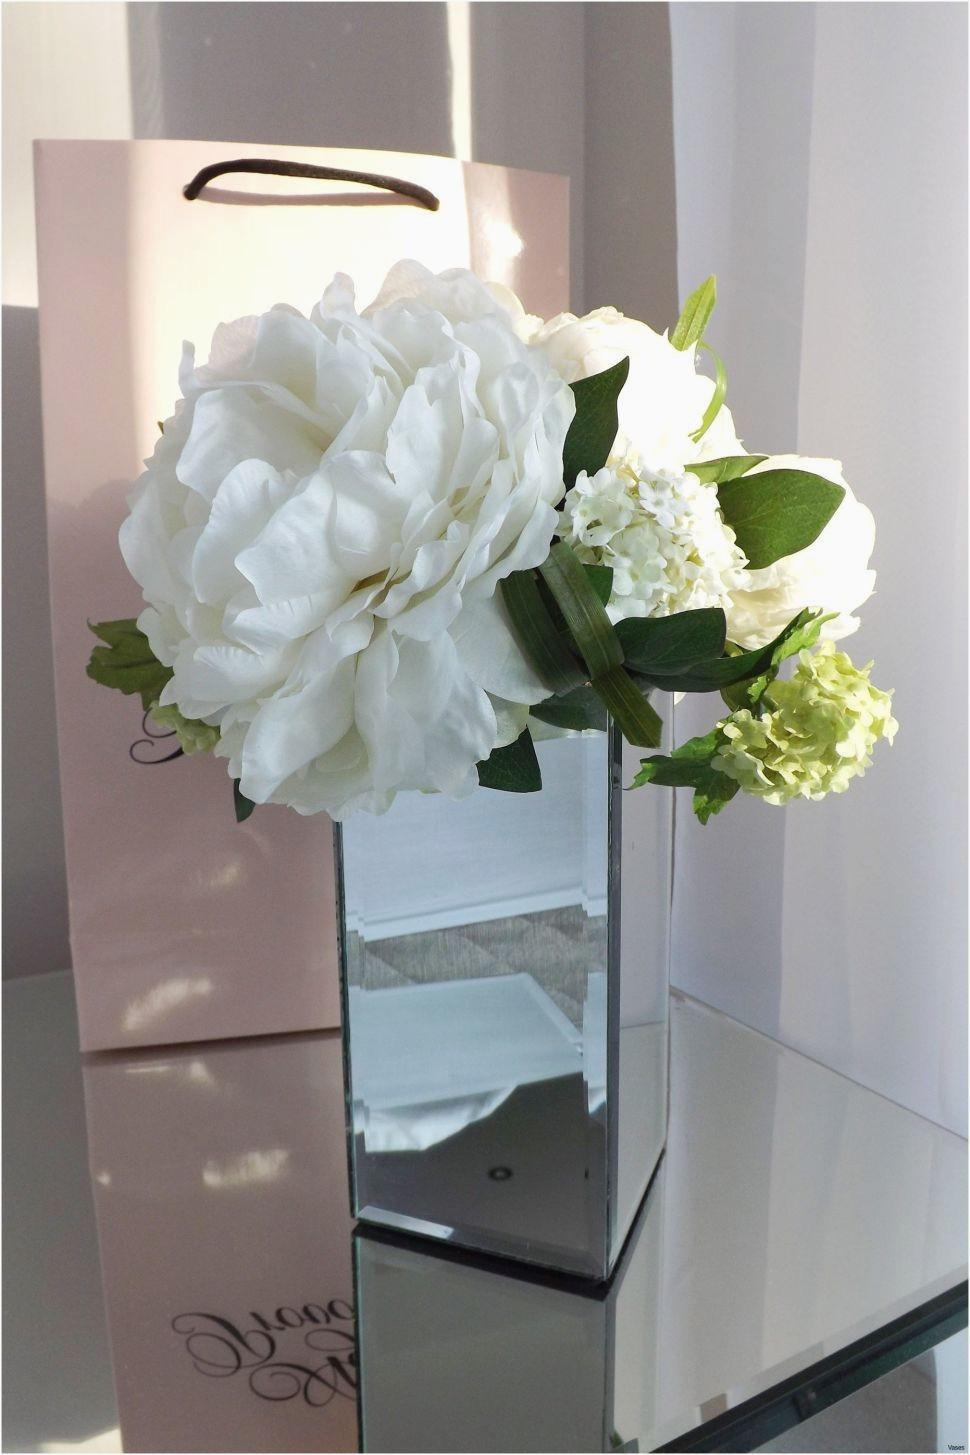 vase table stand of 17 elegant artificial flowers for dining table stampler regarding silk flowers metal vases 3h mirrored mosaic vase votivei 0d design design wedding silk flower